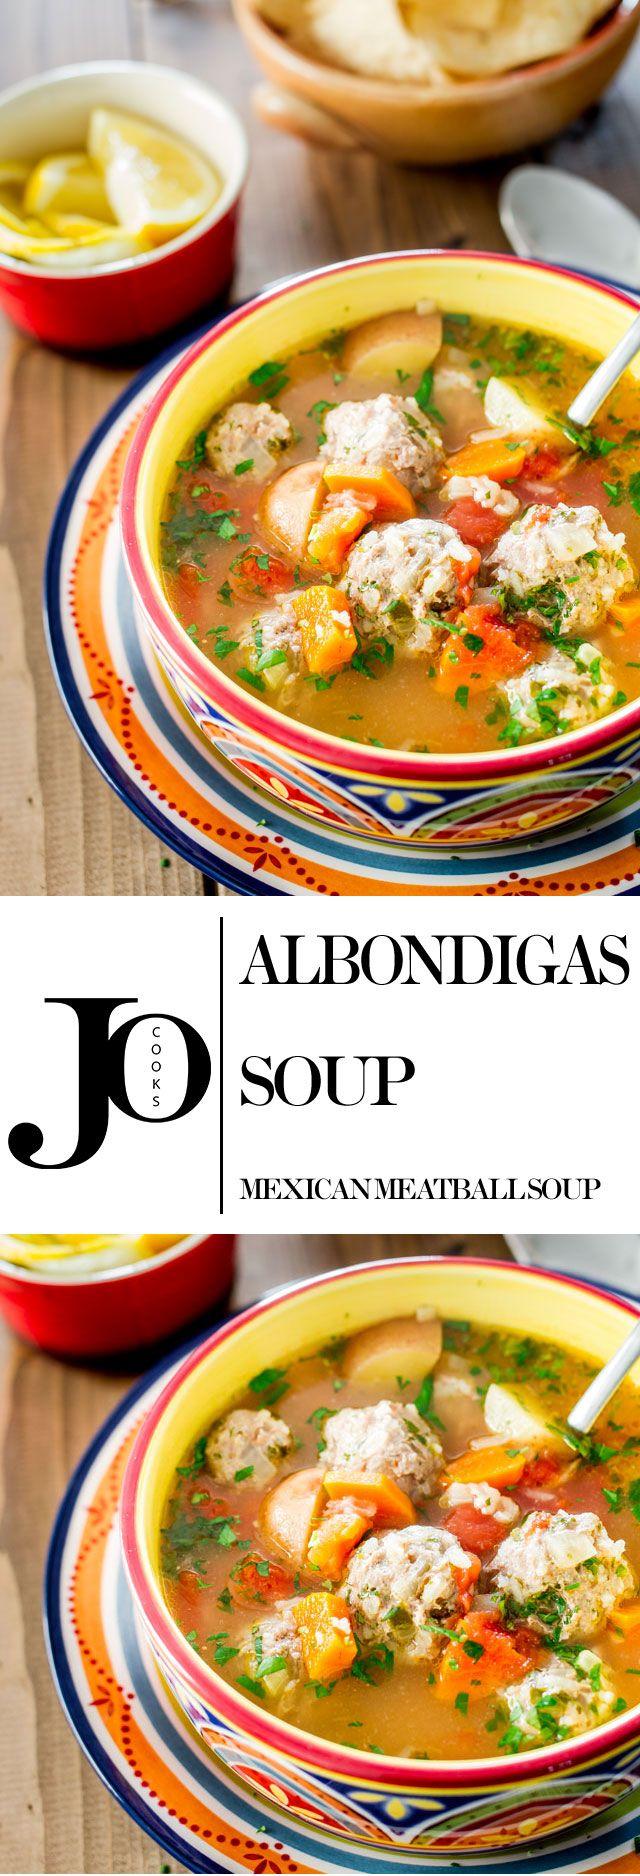 Slow Cooker: Albondigas Soup - Jo Cooks